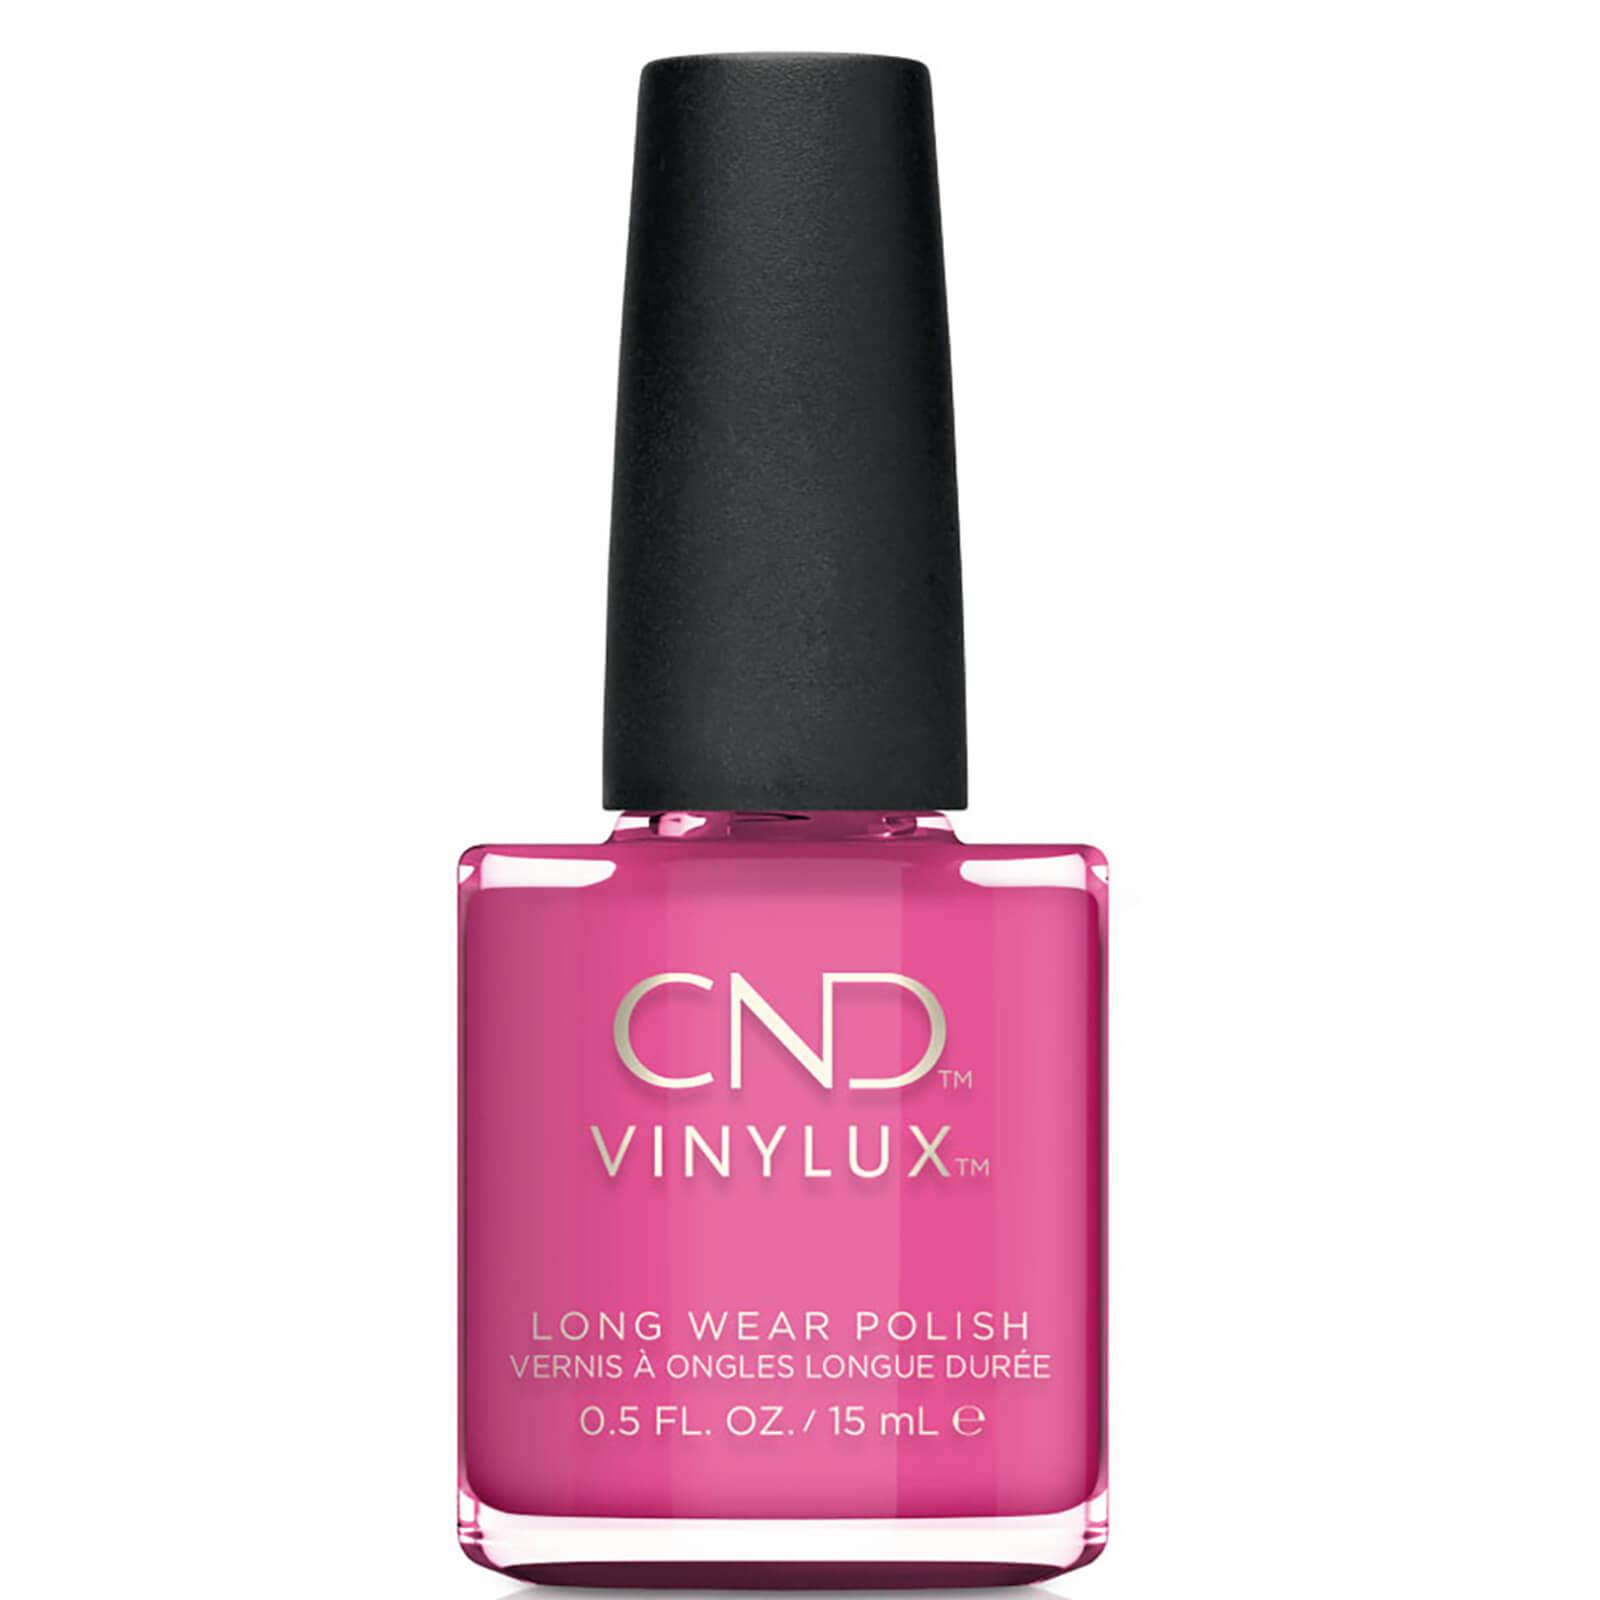 CND Vinylux Hot Pop Pink Nail Varnish 15ml